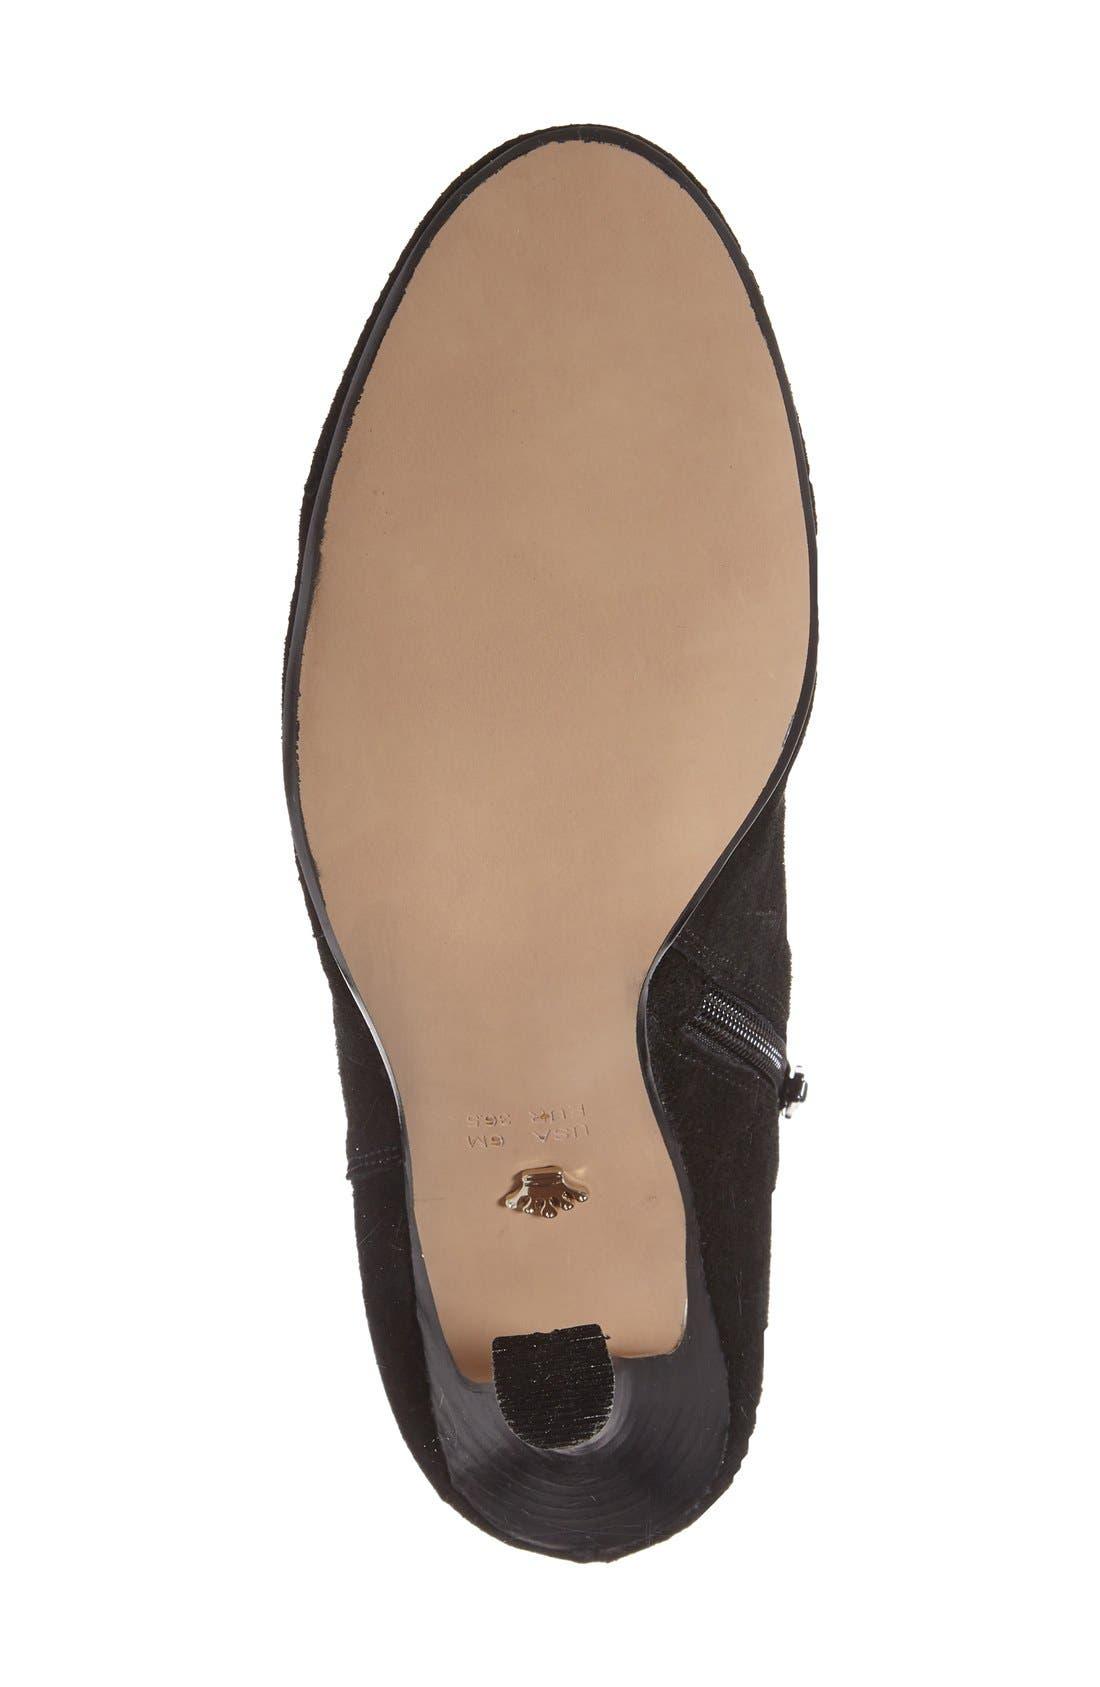 Nina 'Iolathe' Flared Heel Bootie,                             Alternate thumbnail 4, color,                             008